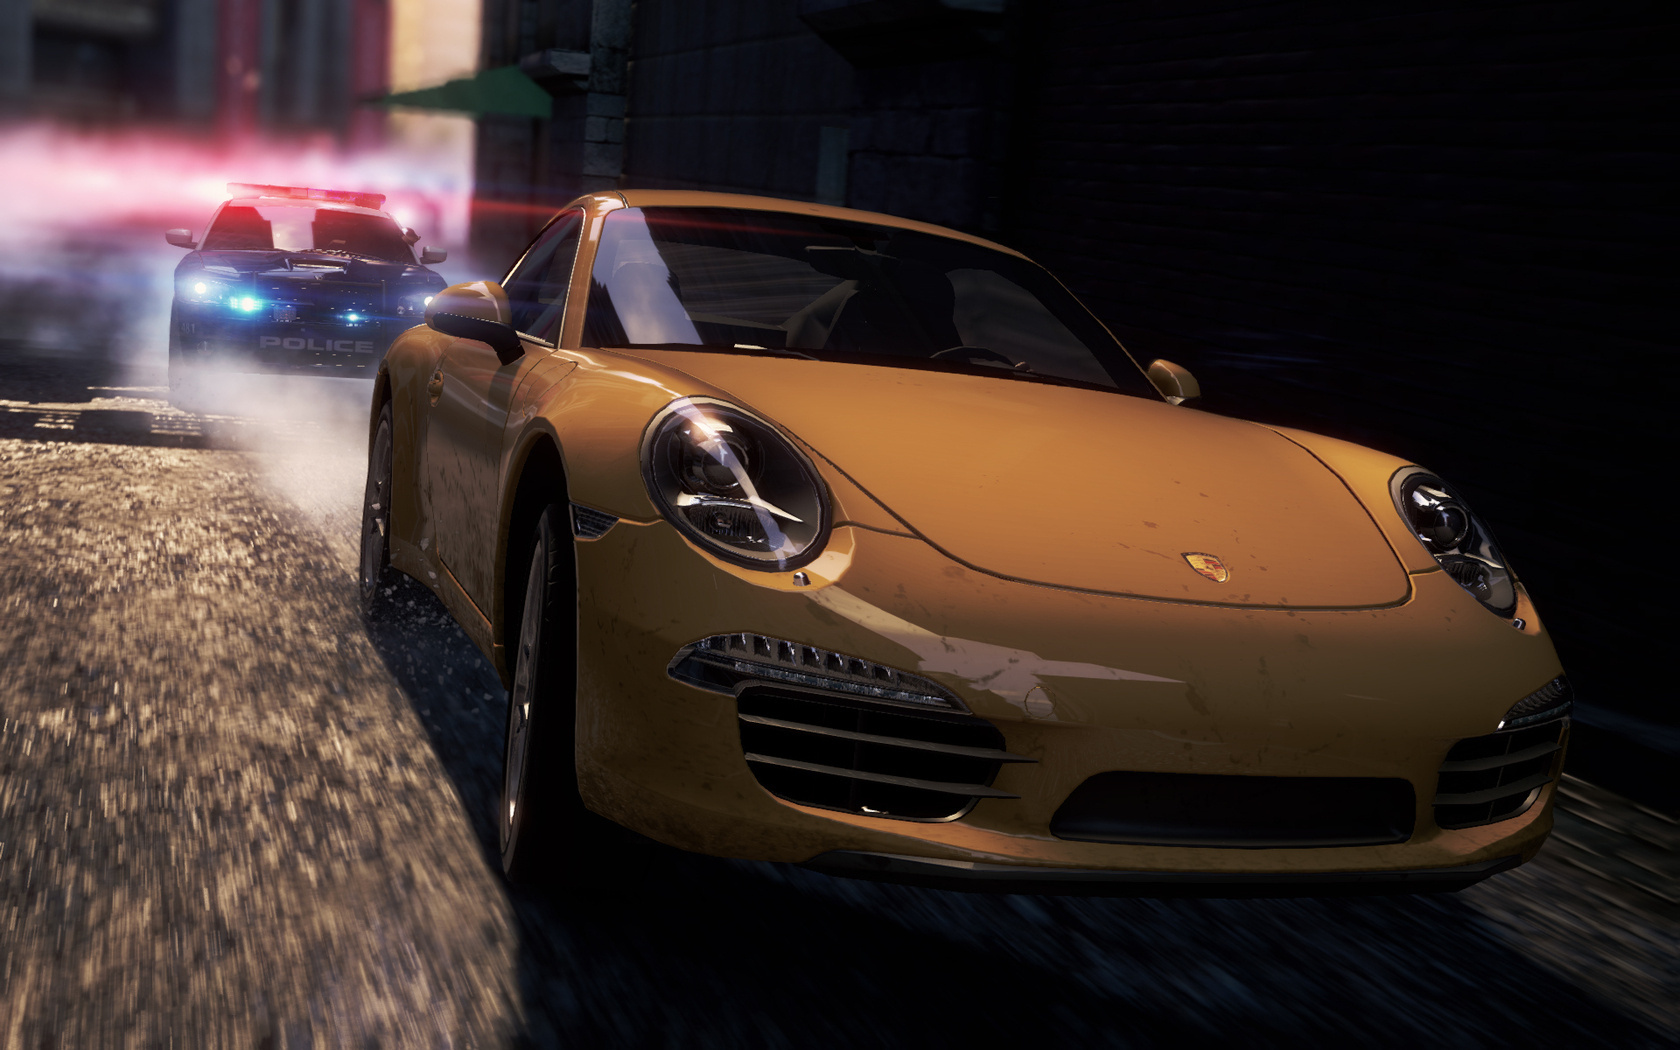 Need For Speed Most Wanted 2 - обои для рабочего стола